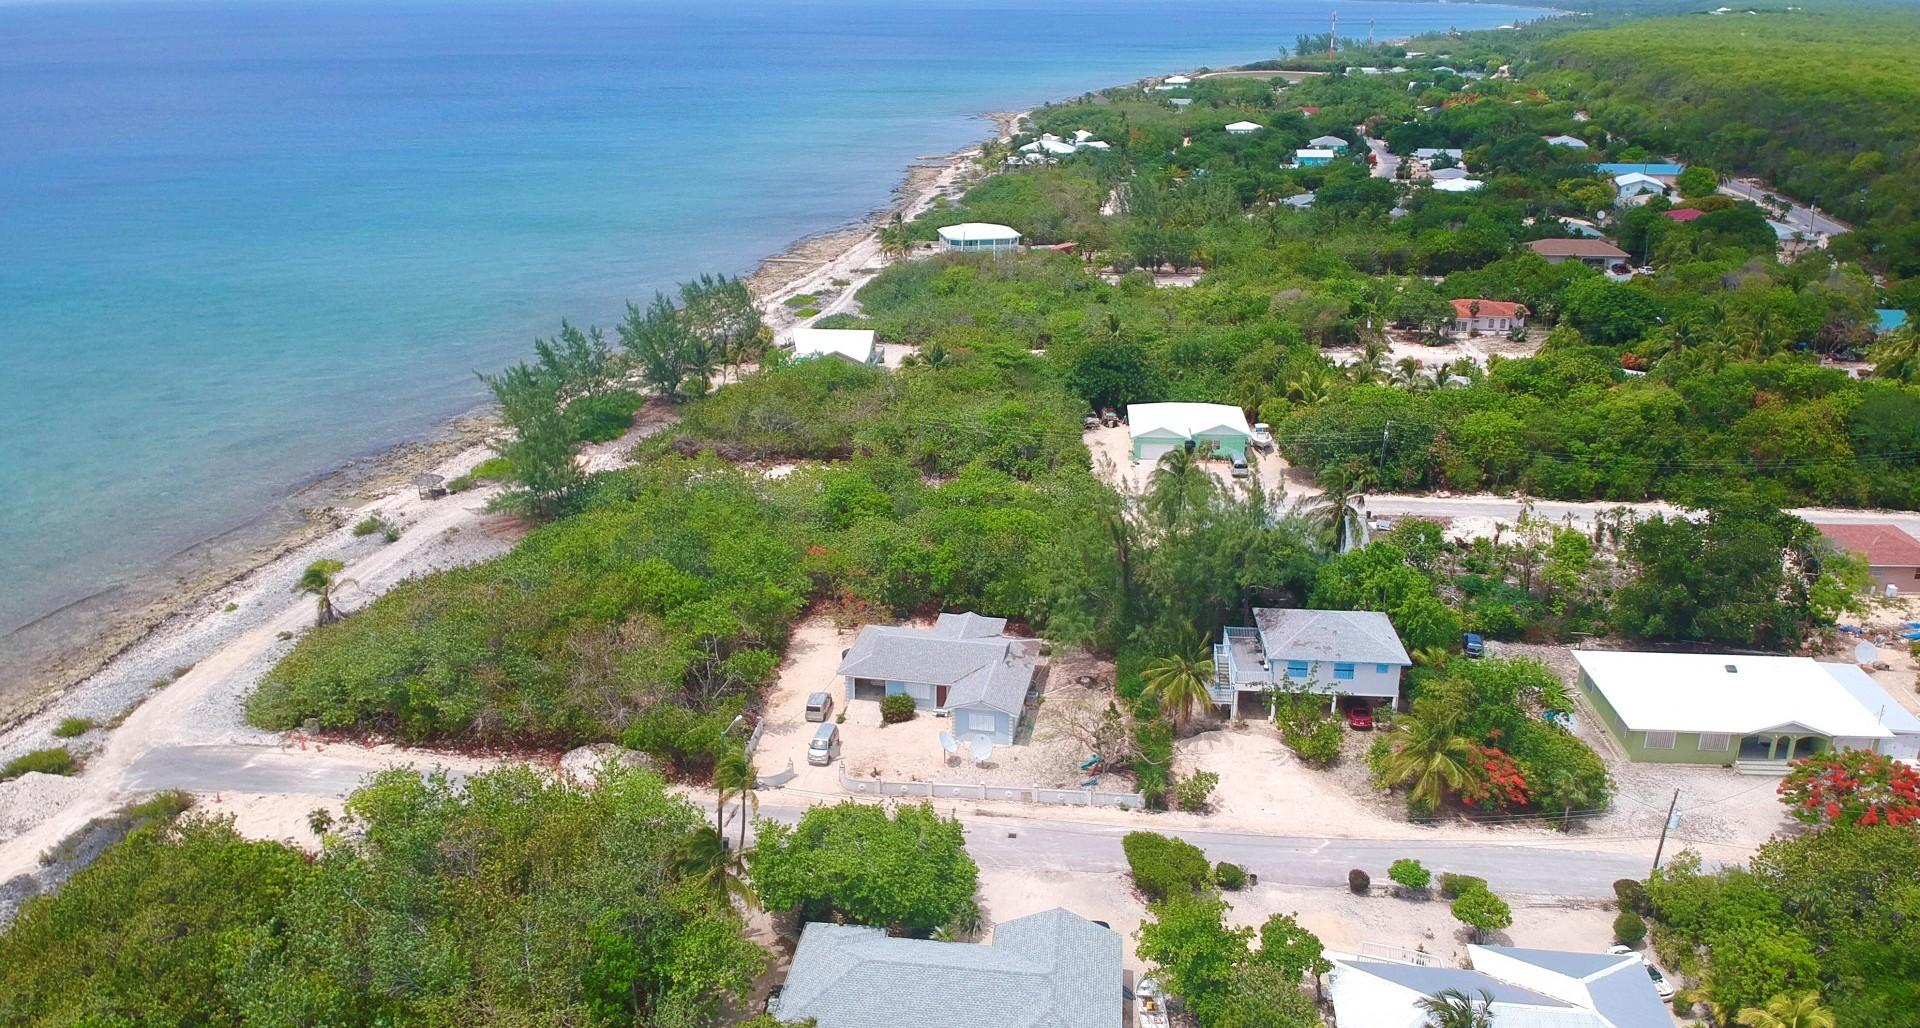 64 Cottage Drive – Cayman Brac